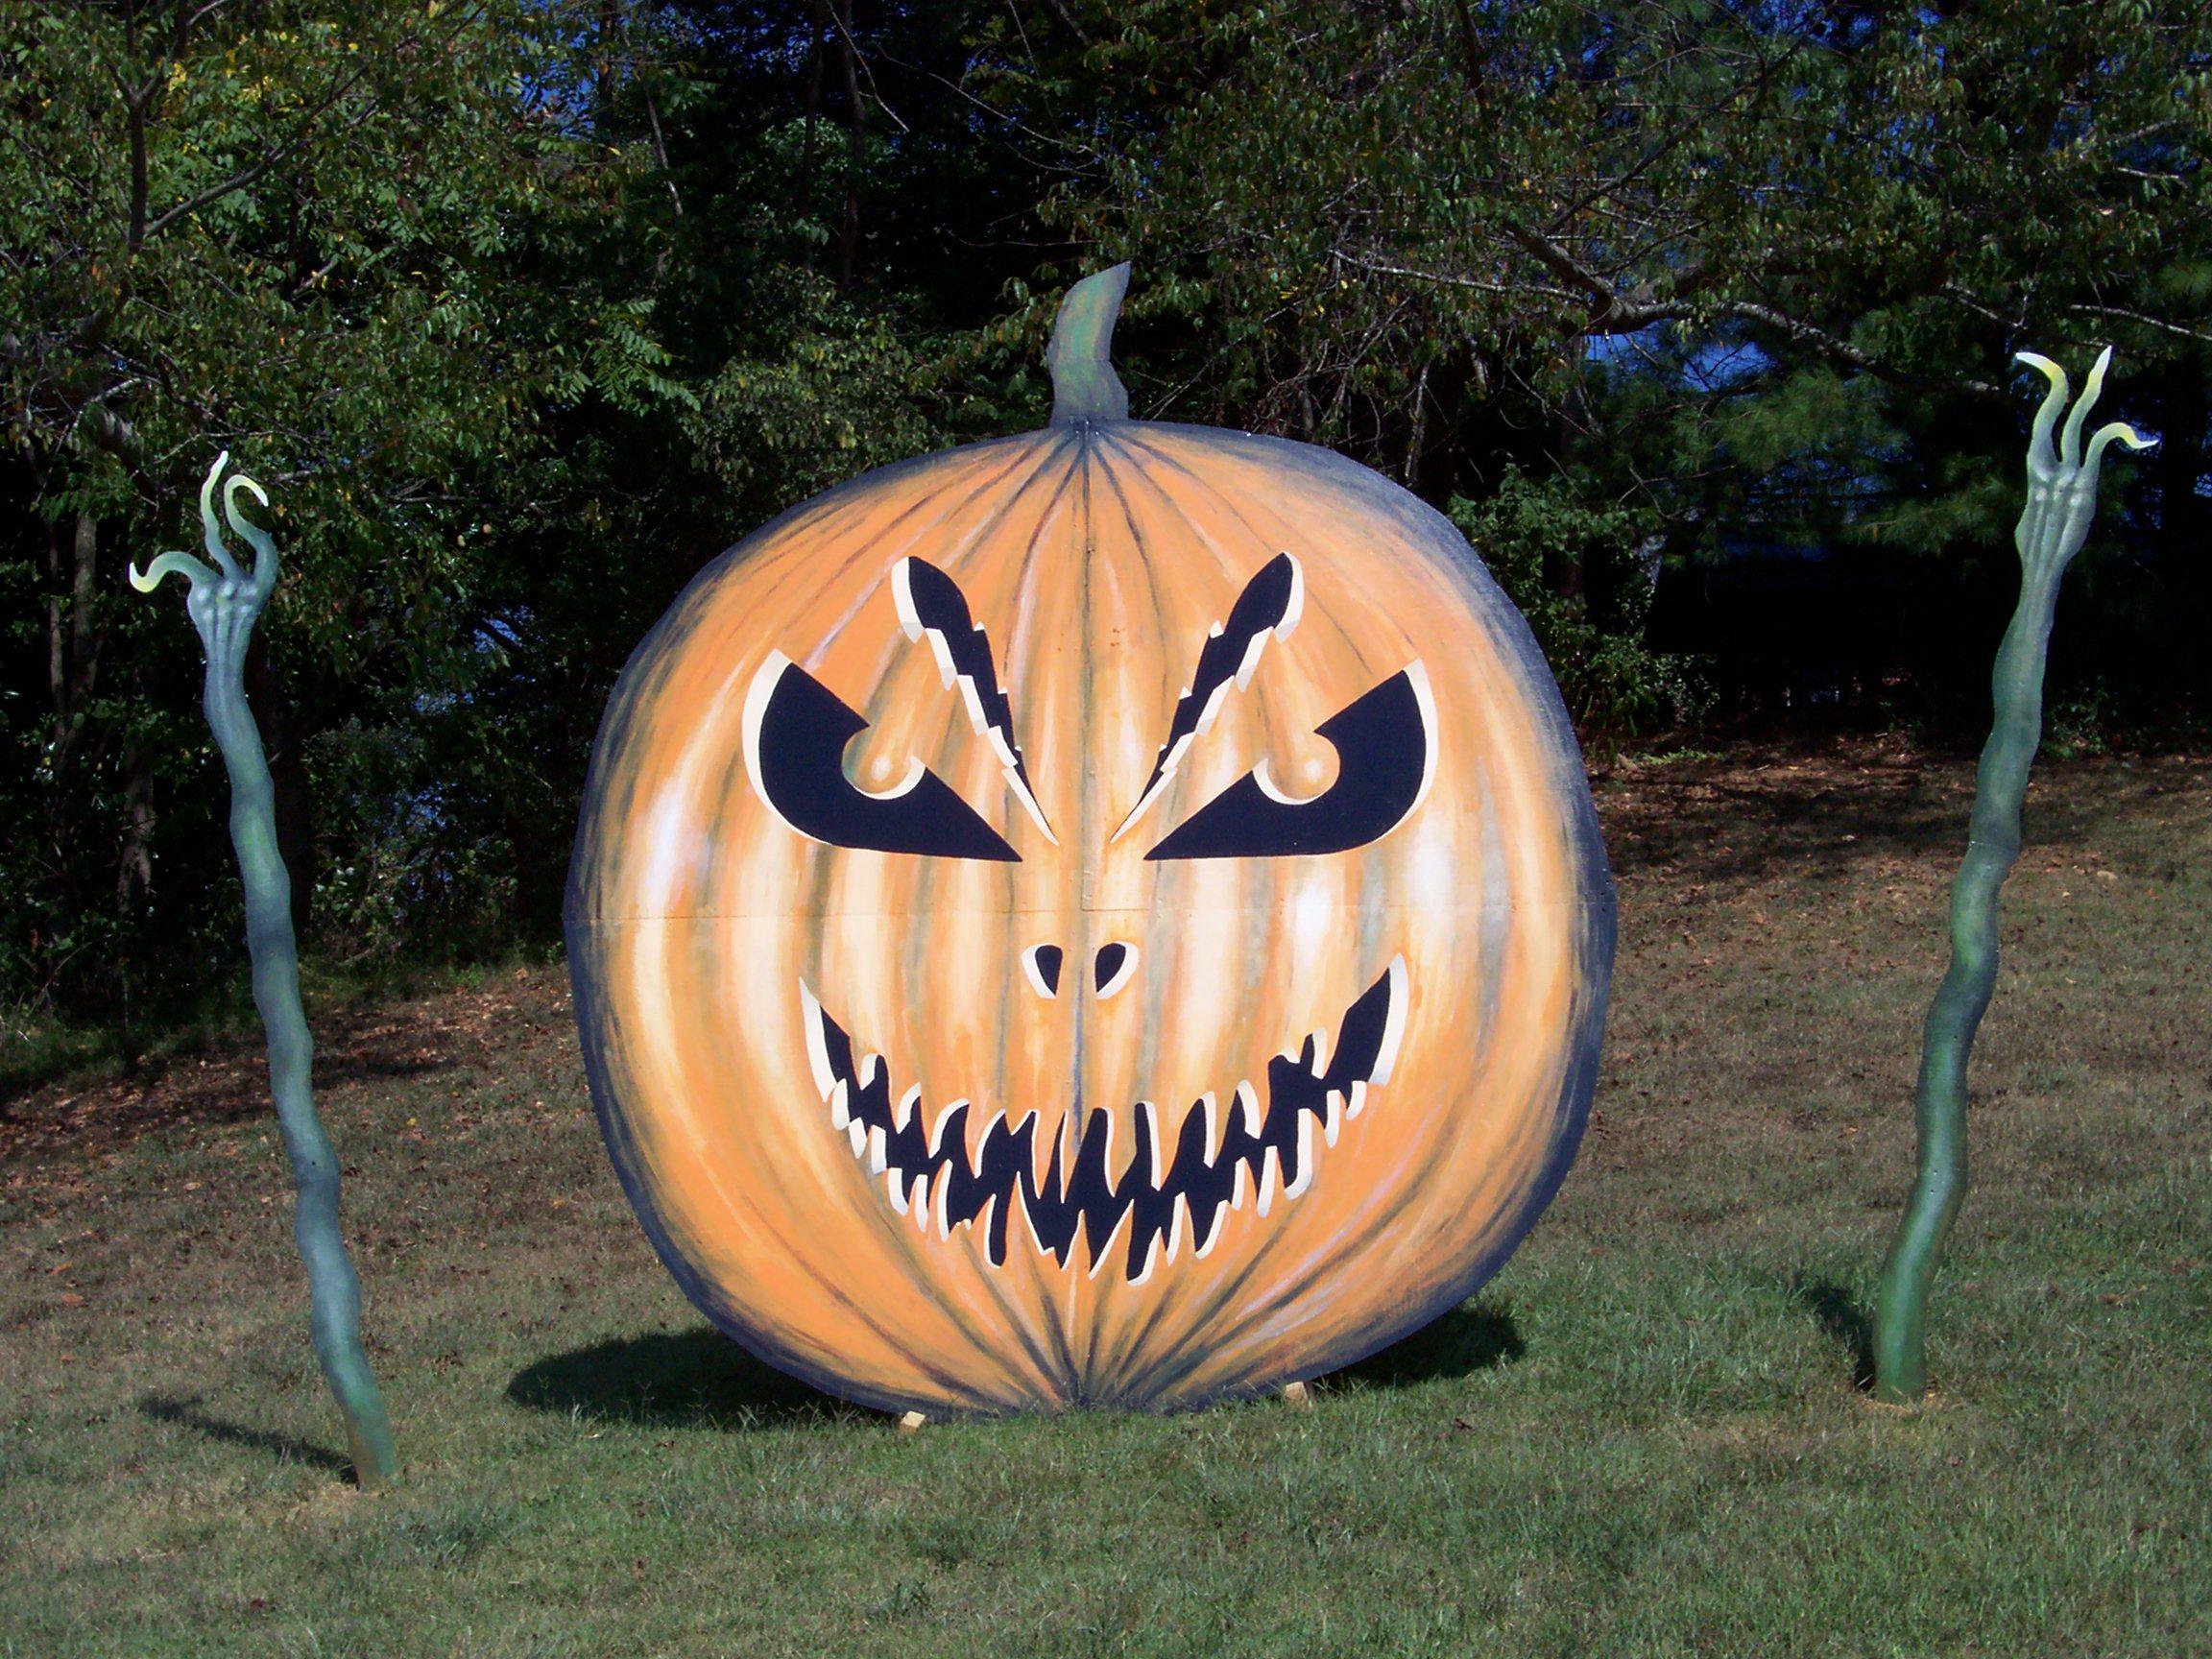 Giant Jack-o-lantern